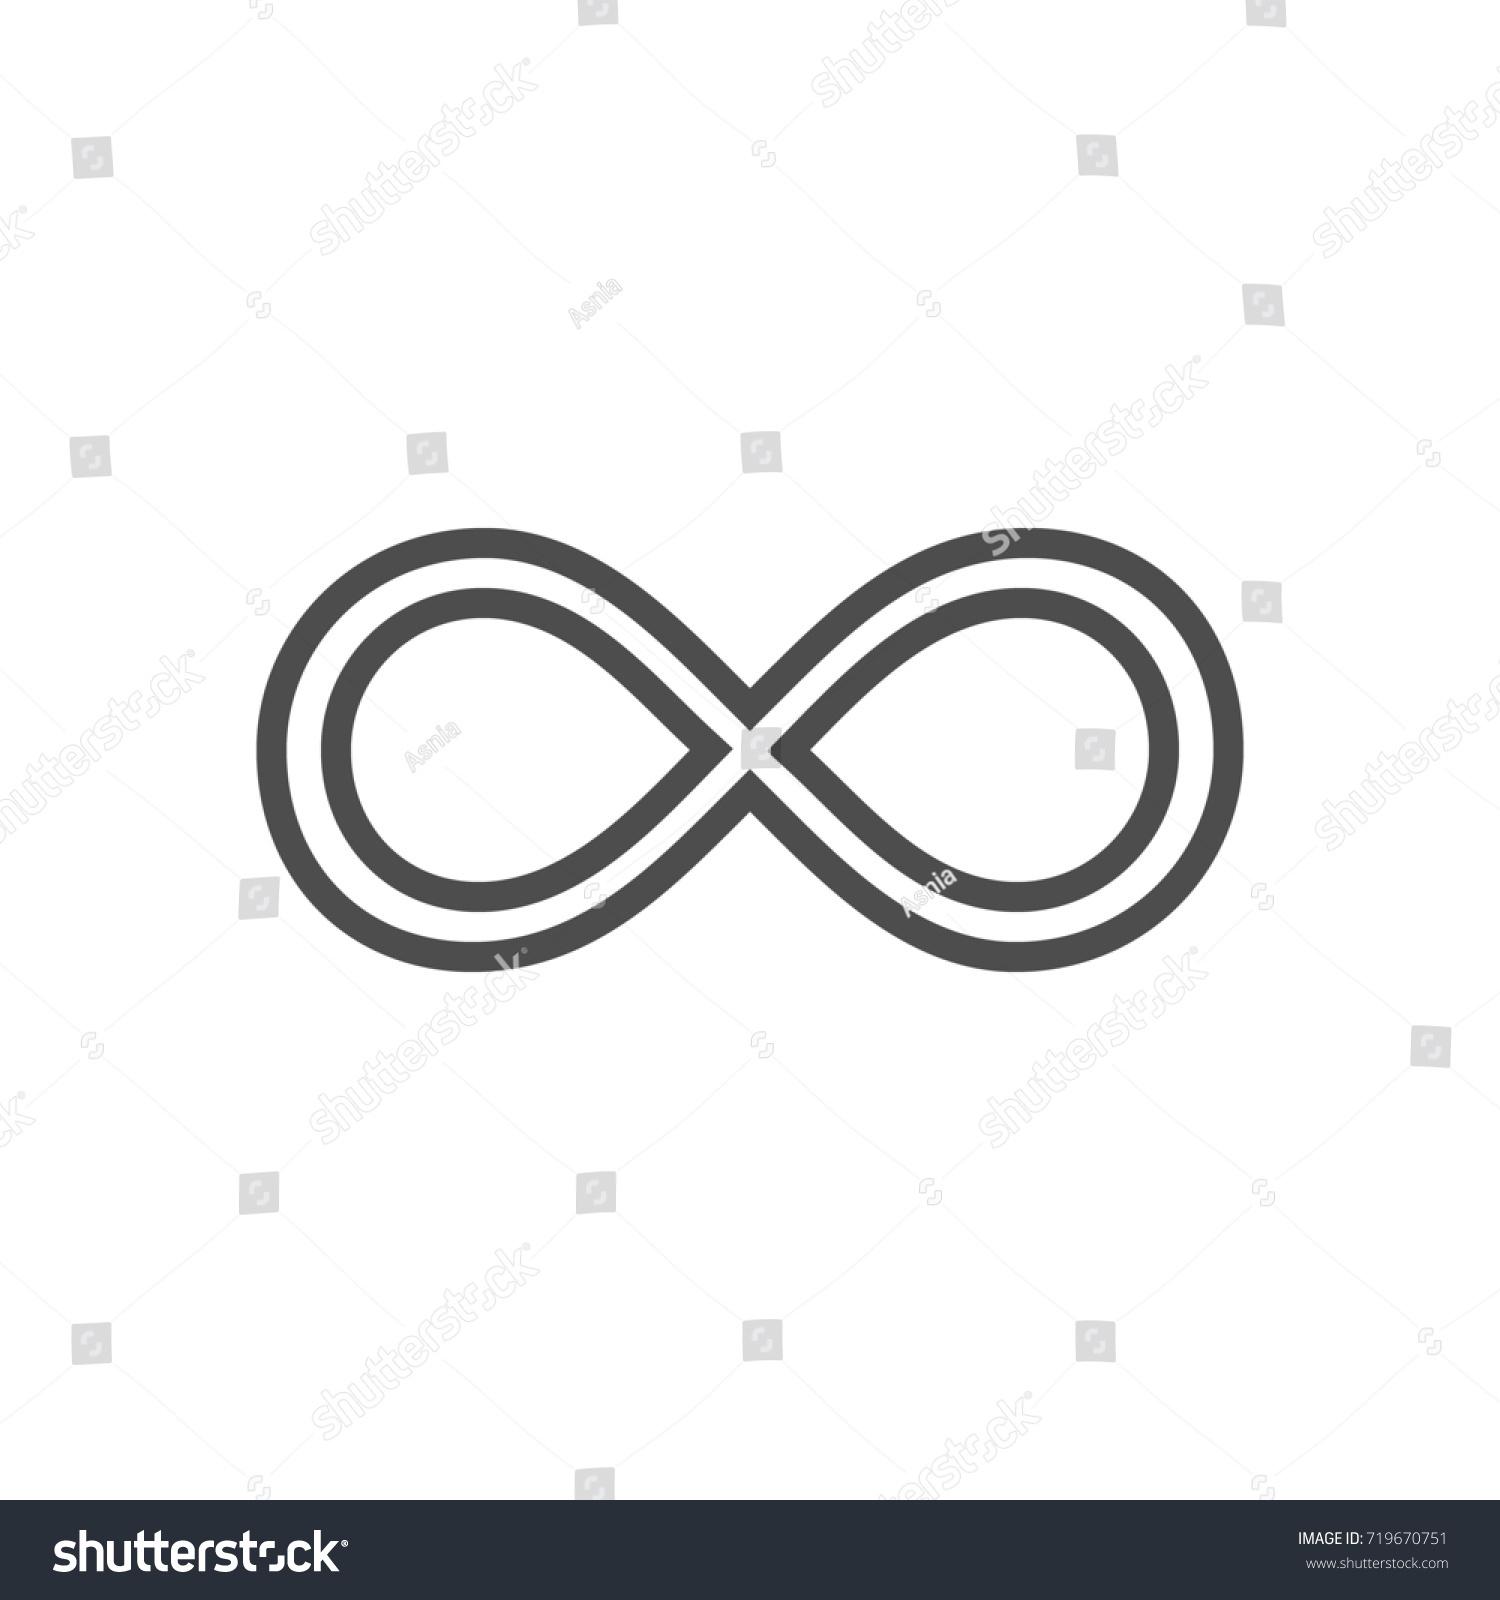 Infinity symbol loop figure 8 icon stock illustration 719670751 infinity symbol loop figure 8 icon eternity logo sign in original design forever biocorpaavc